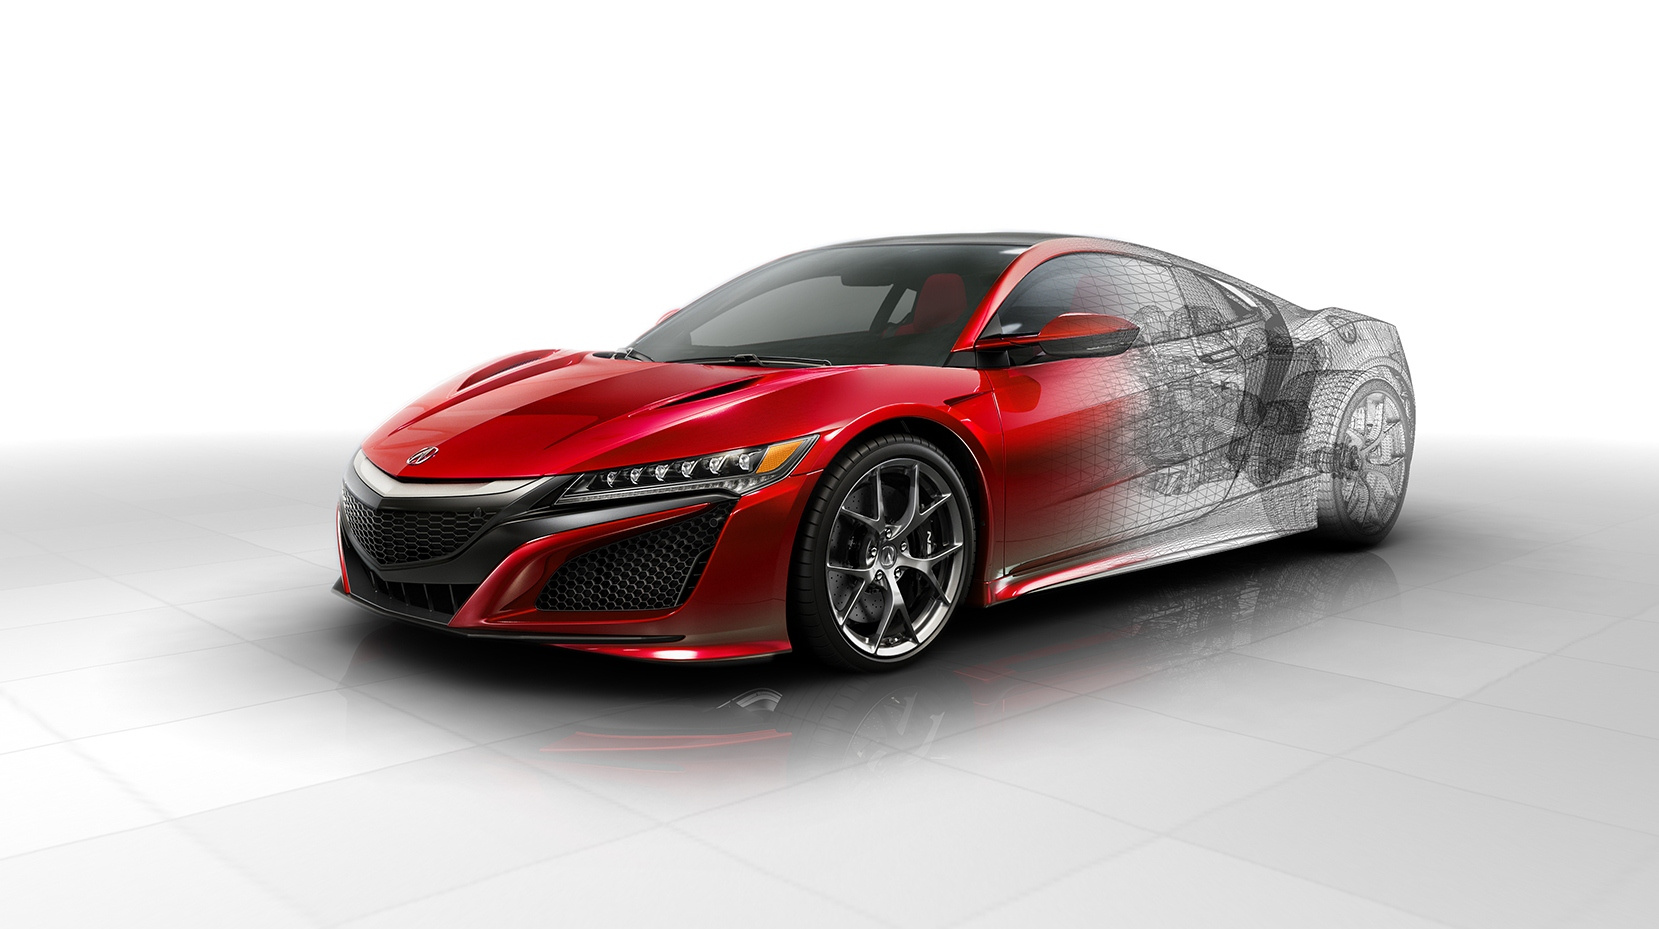 2017 Honda NSX – full technical rundown on Honda's AWD twin-turbocharged 573 hp hybrid supercar ...